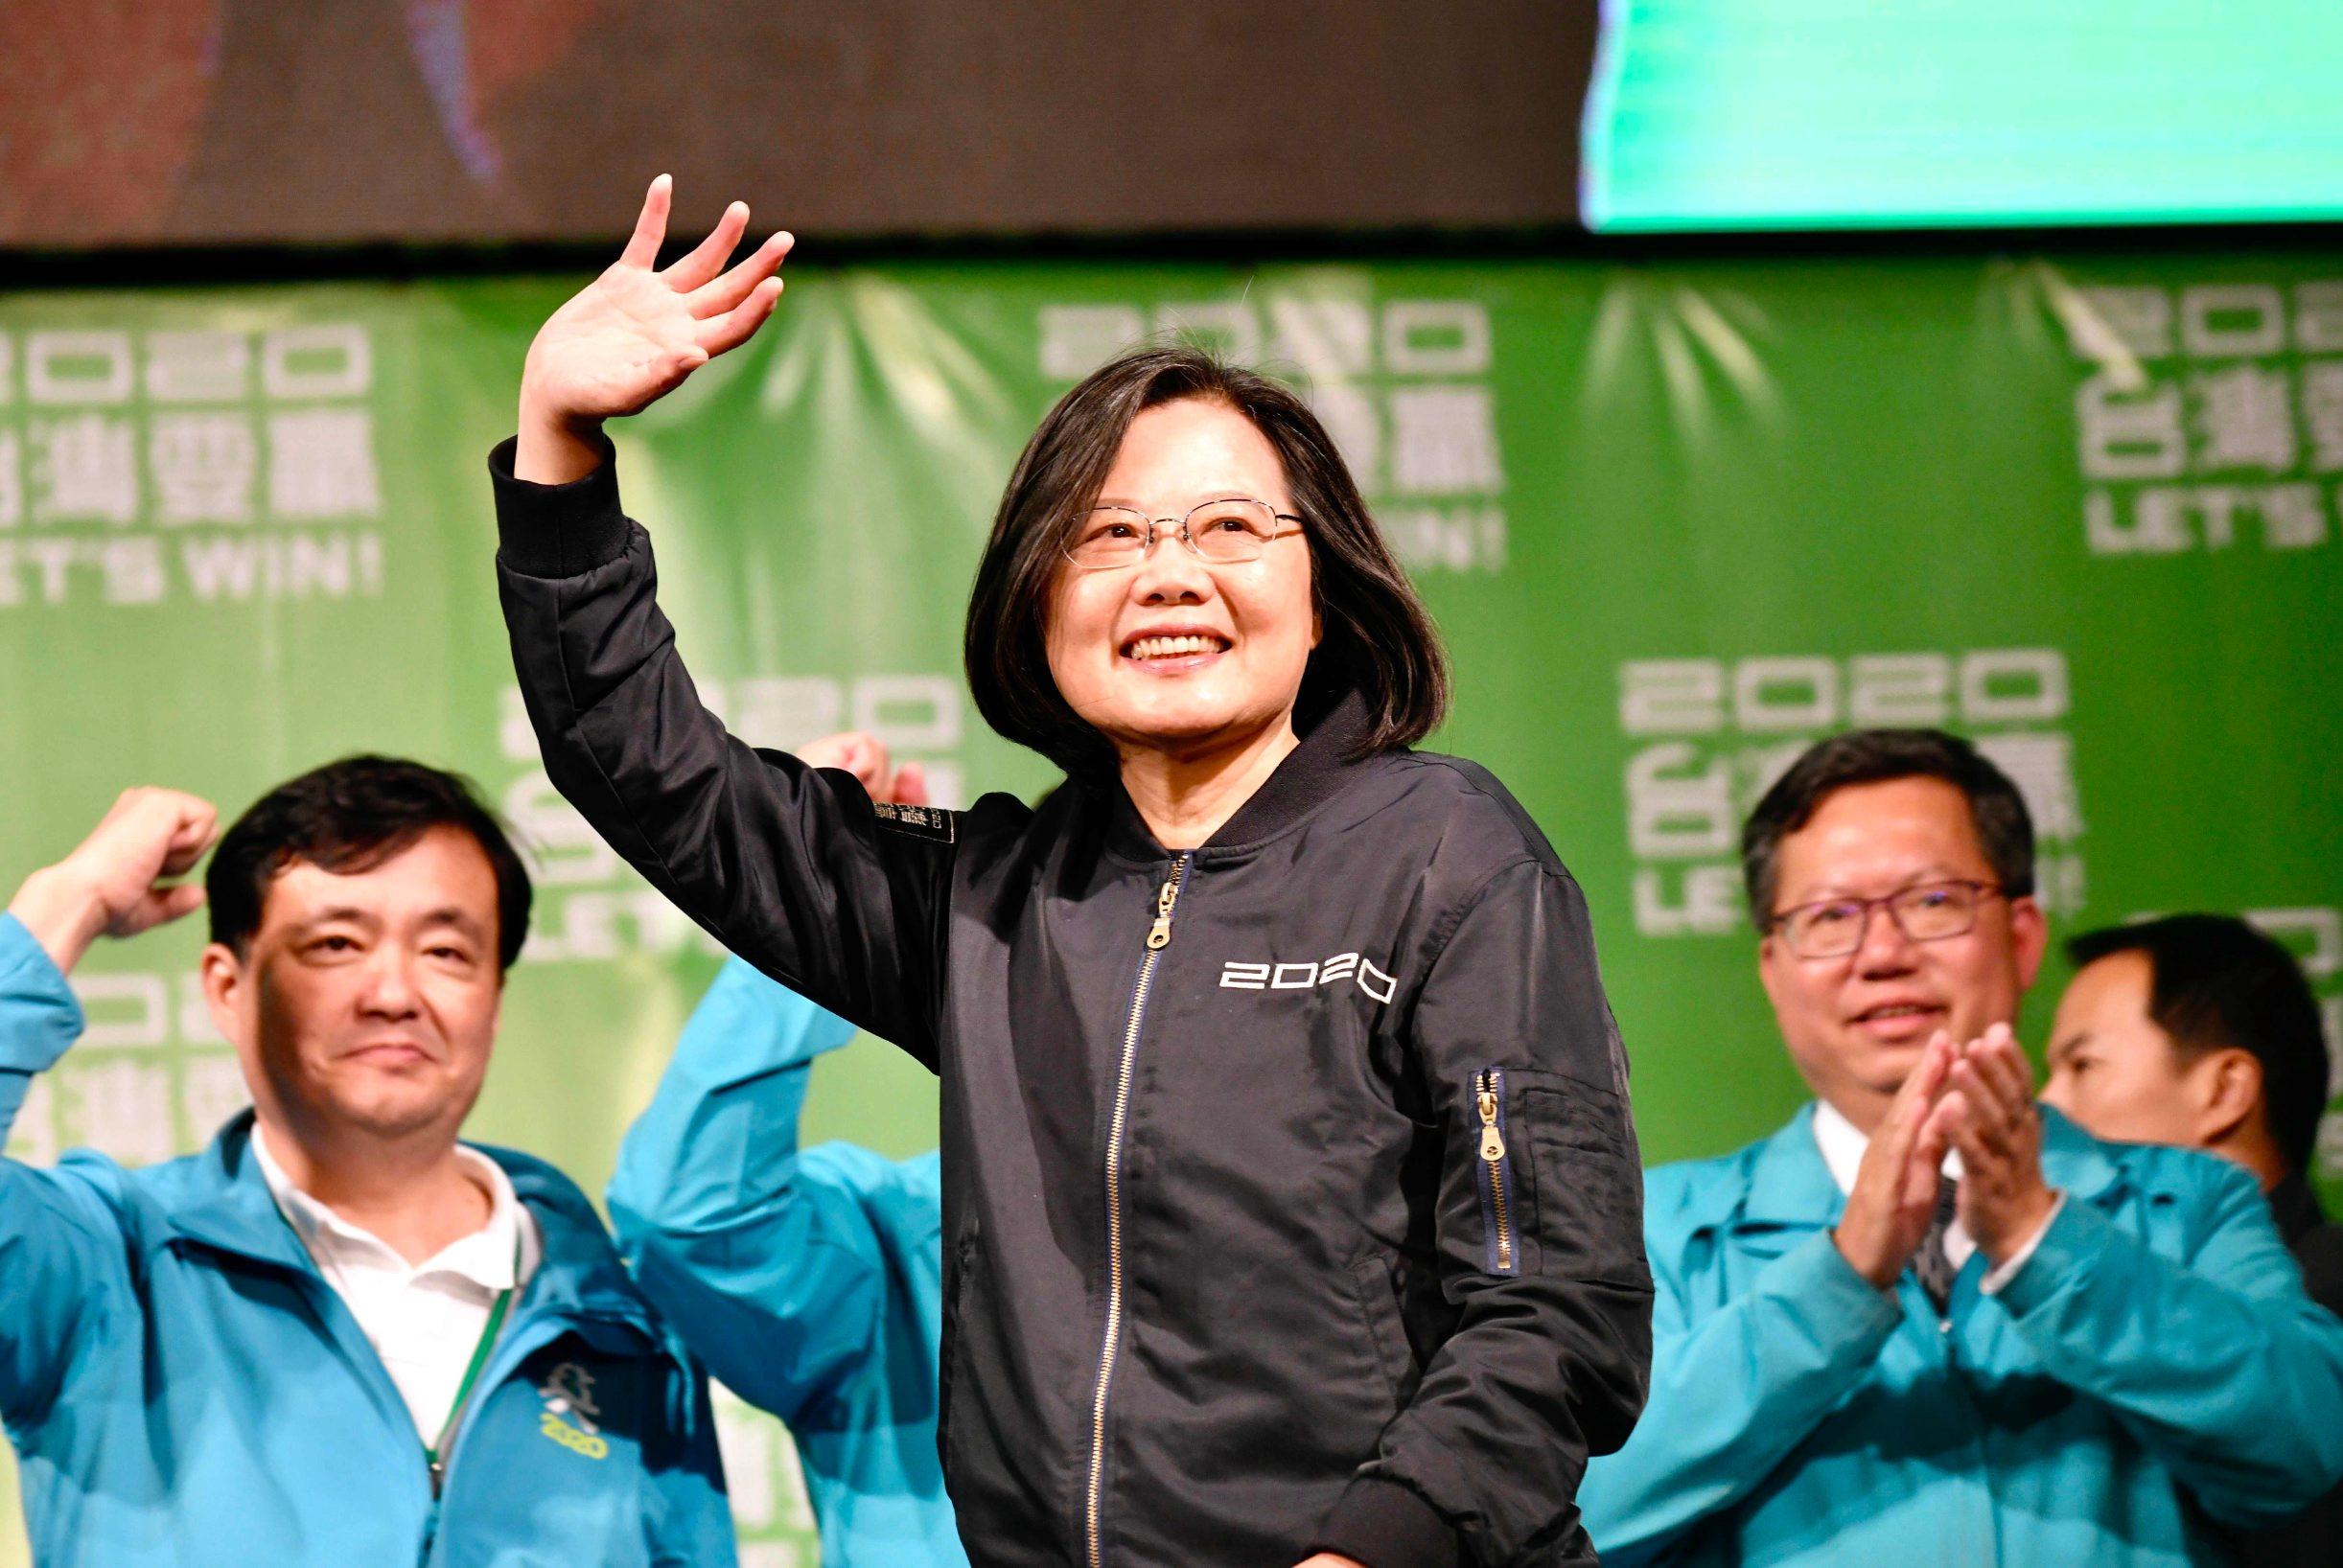 Tajvanska predsjednica Tsai Ing-wen